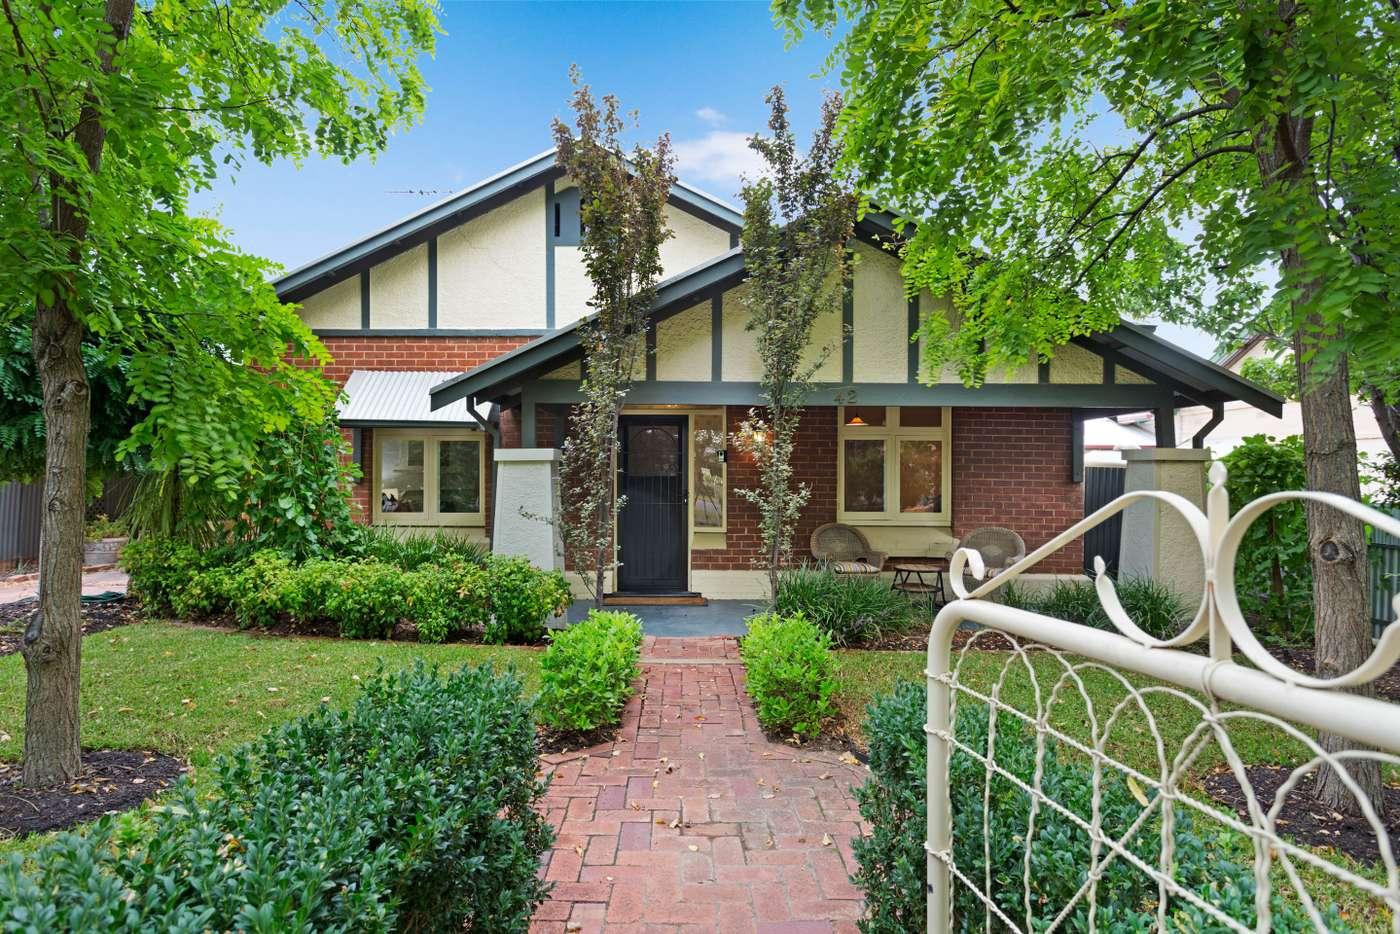 Main view of Homely house listing, 42 Sturt Avenue, Colonel Light Gardens SA 5041